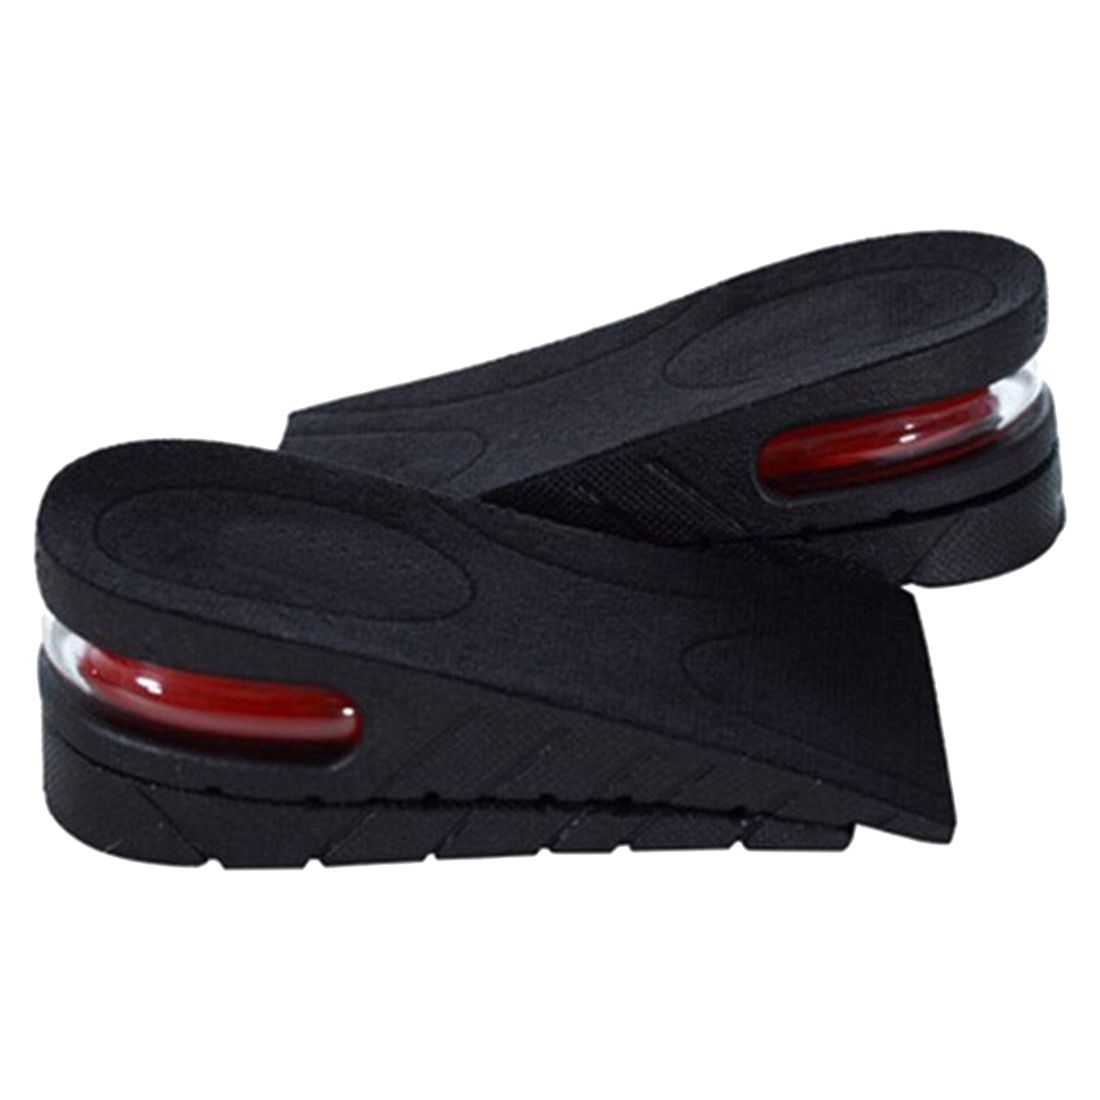 Men Women Shoe Insole Air Cushion Heel insert Increase Tall Height Lift 5cm men women shoe insole air cushion adjustable heel insert increase lift heel inserts higher shoes pads layer taller 5cm 2inch